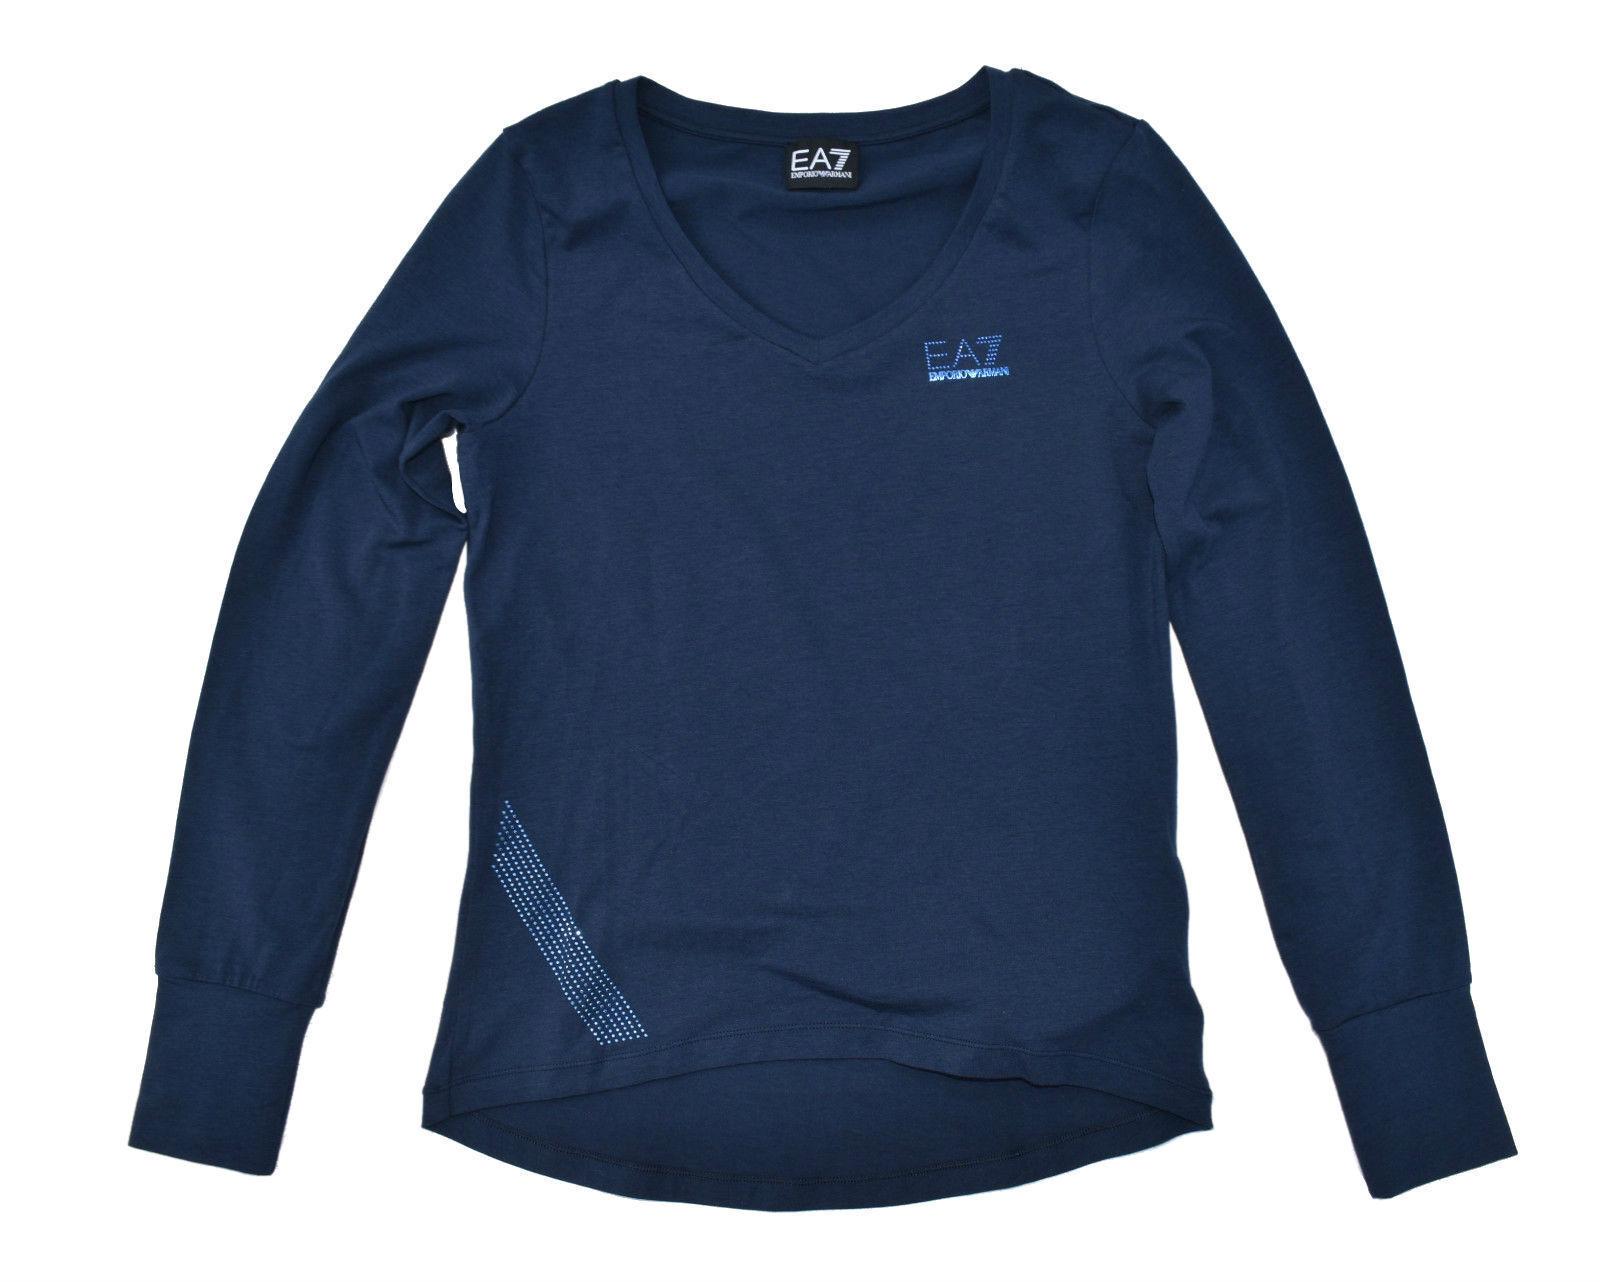 EA7 Damen Langarmshirt Sport Jogging Fitness Modal Cotton Longsleeves Glamour